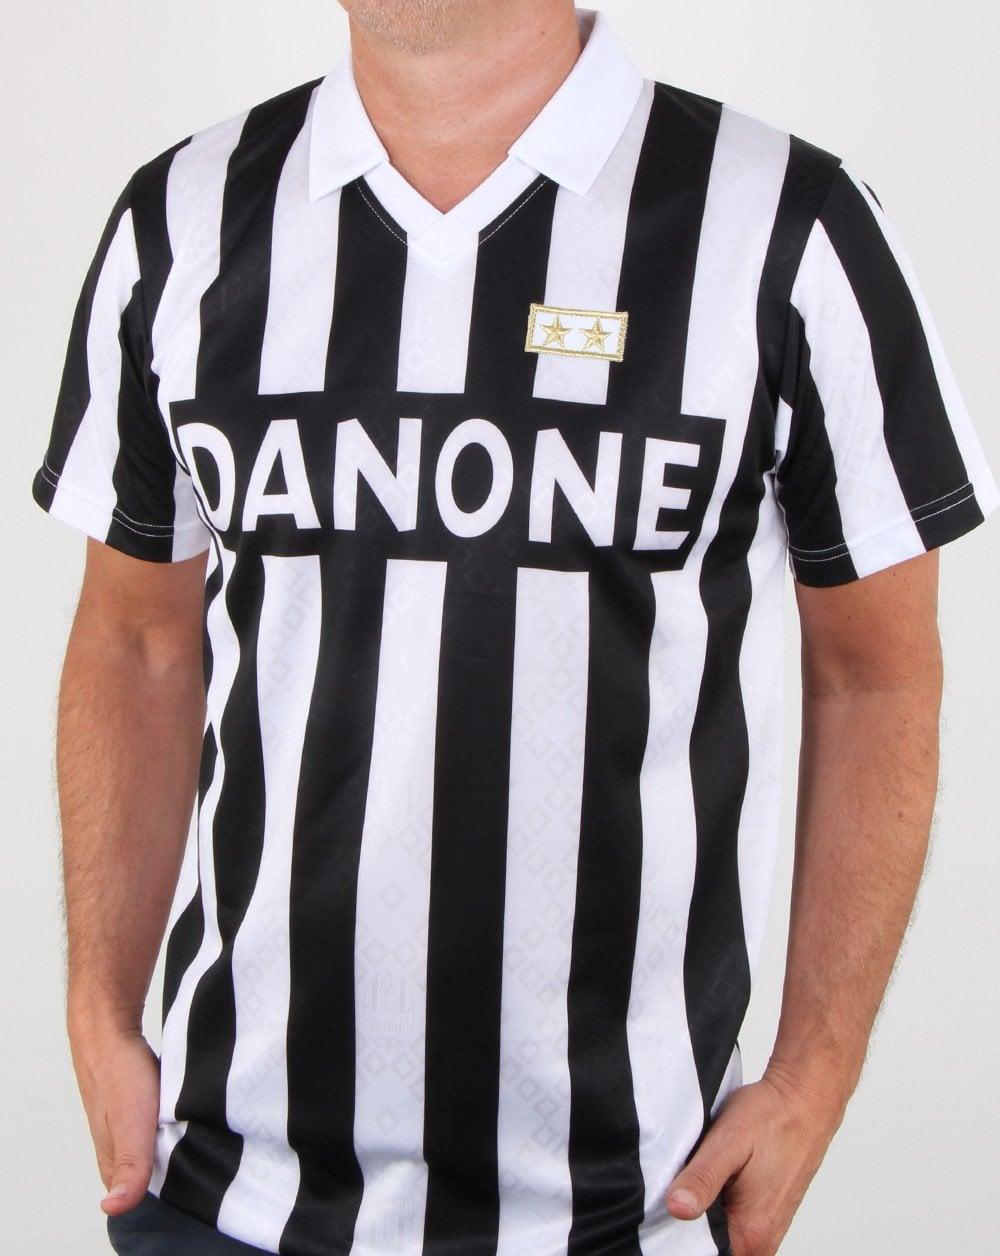 d06ef0c05 80s Casual Classics 80s Casual Classics Juventus 1993 Uefa Cup Final Shirt  Black white